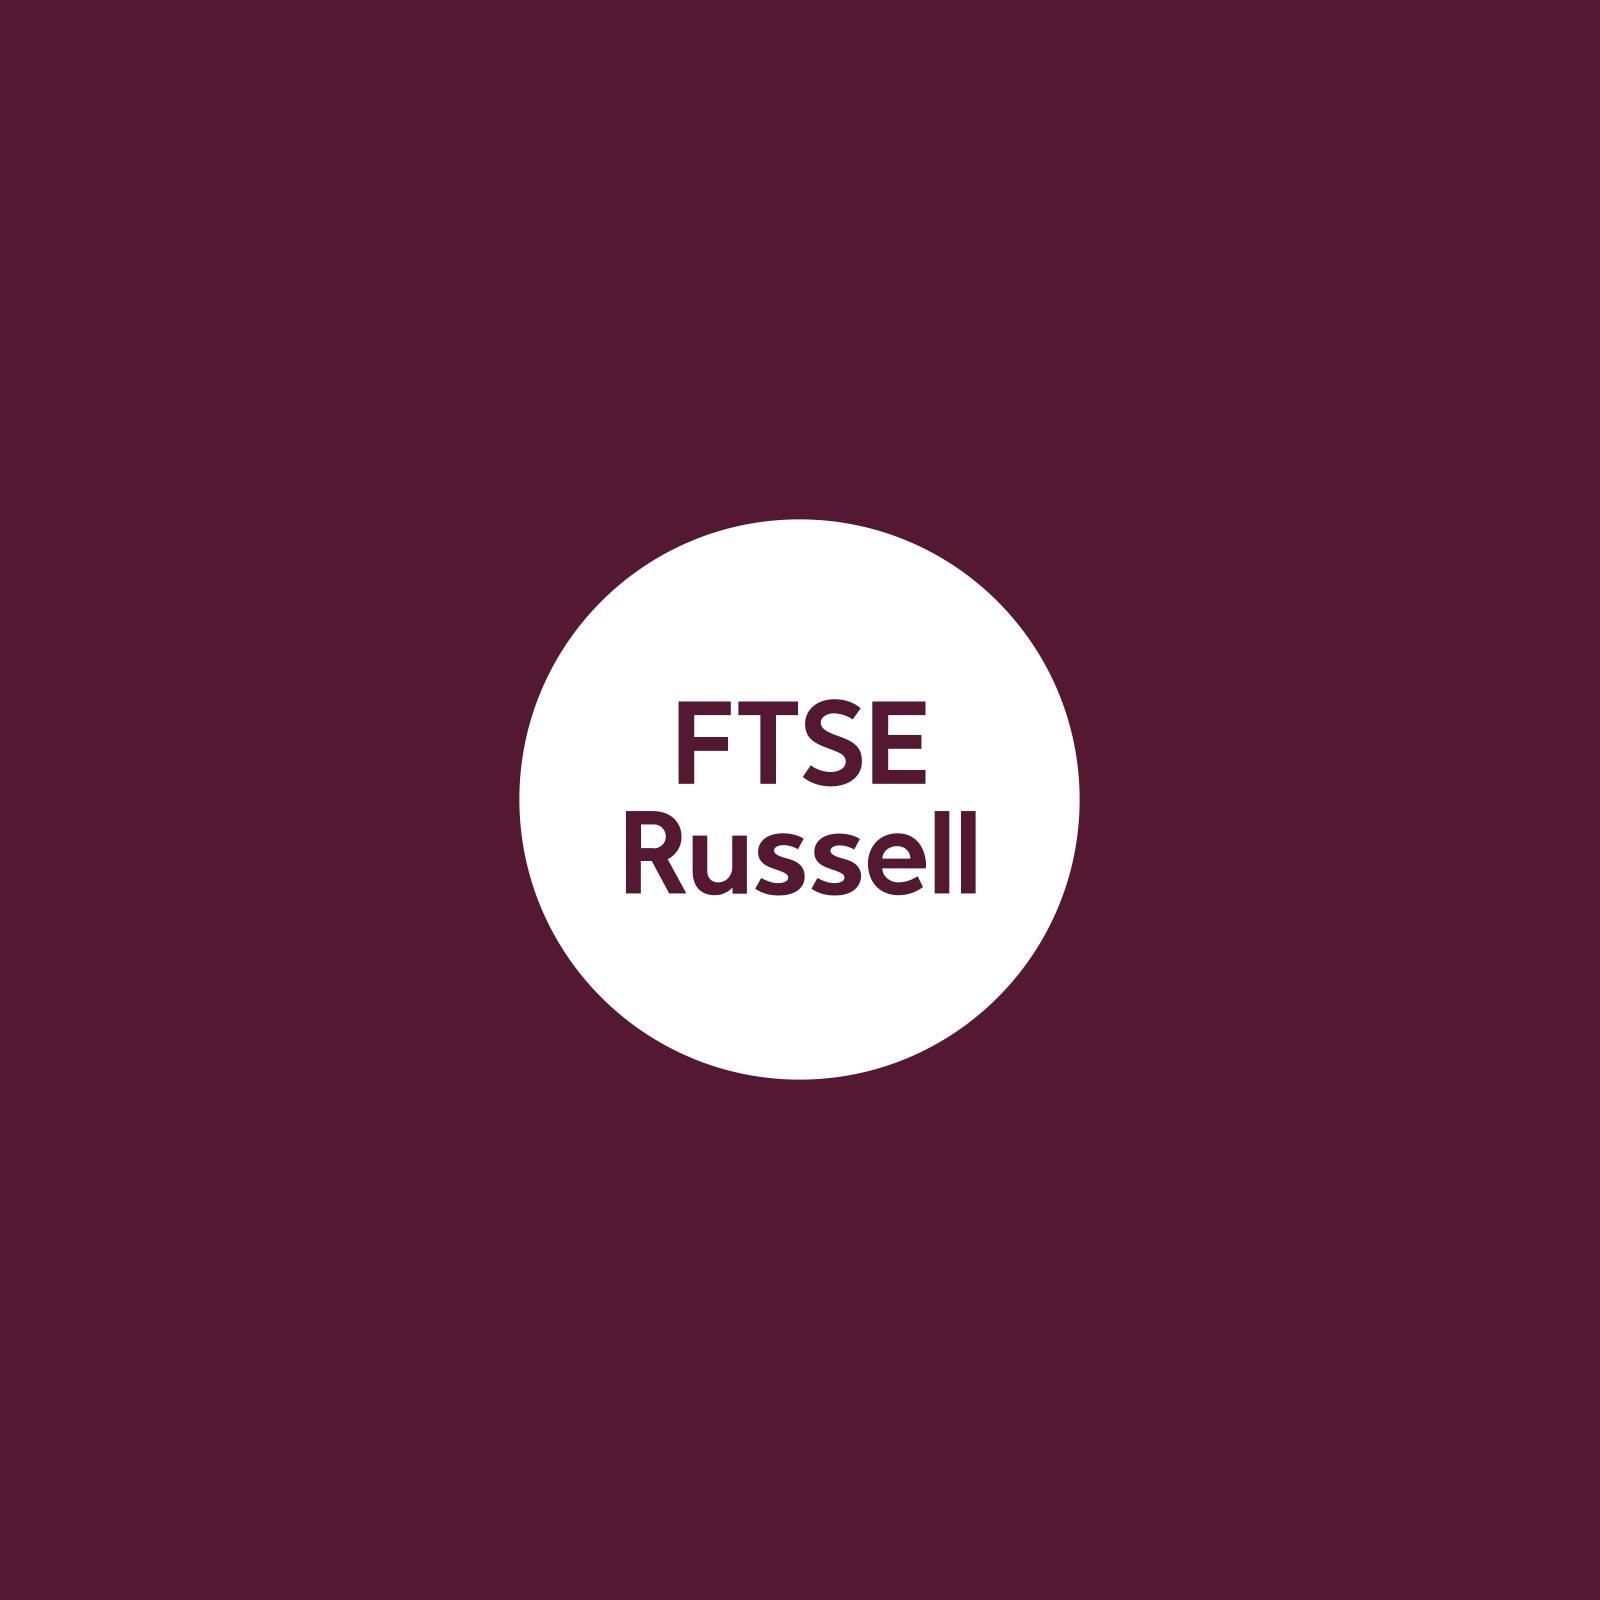 FTSE Russell_logo.jpg